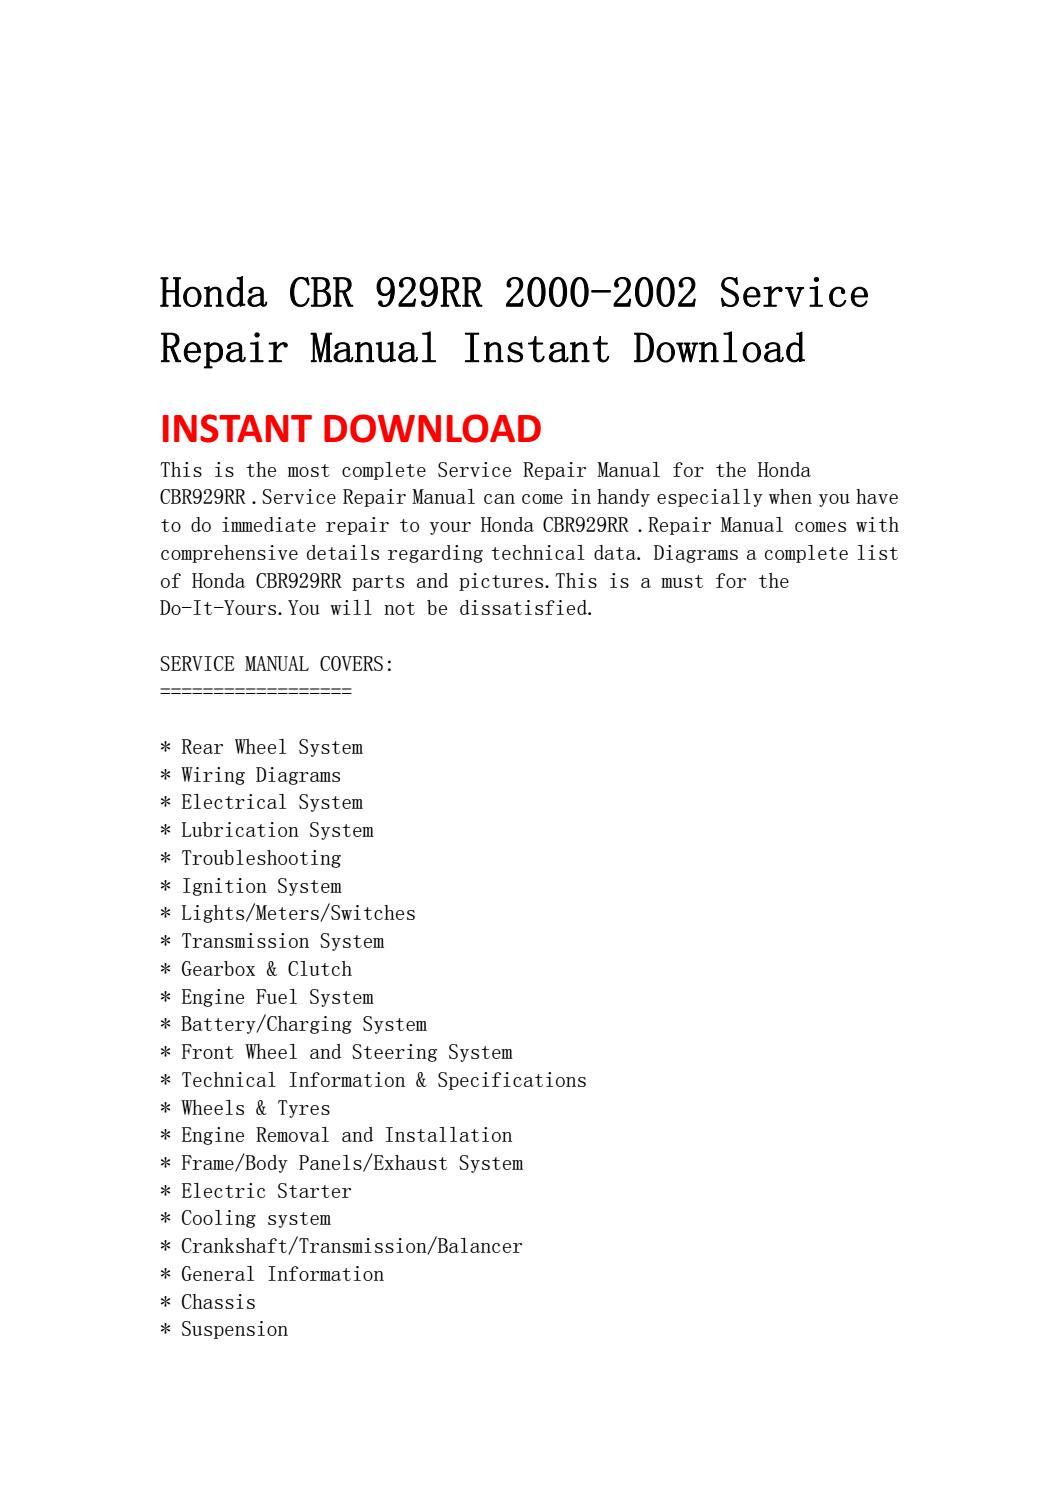 Honda cbr 929rr 2000 2002 service repair manual instant download by  jhsenfuh - issuuIssuu